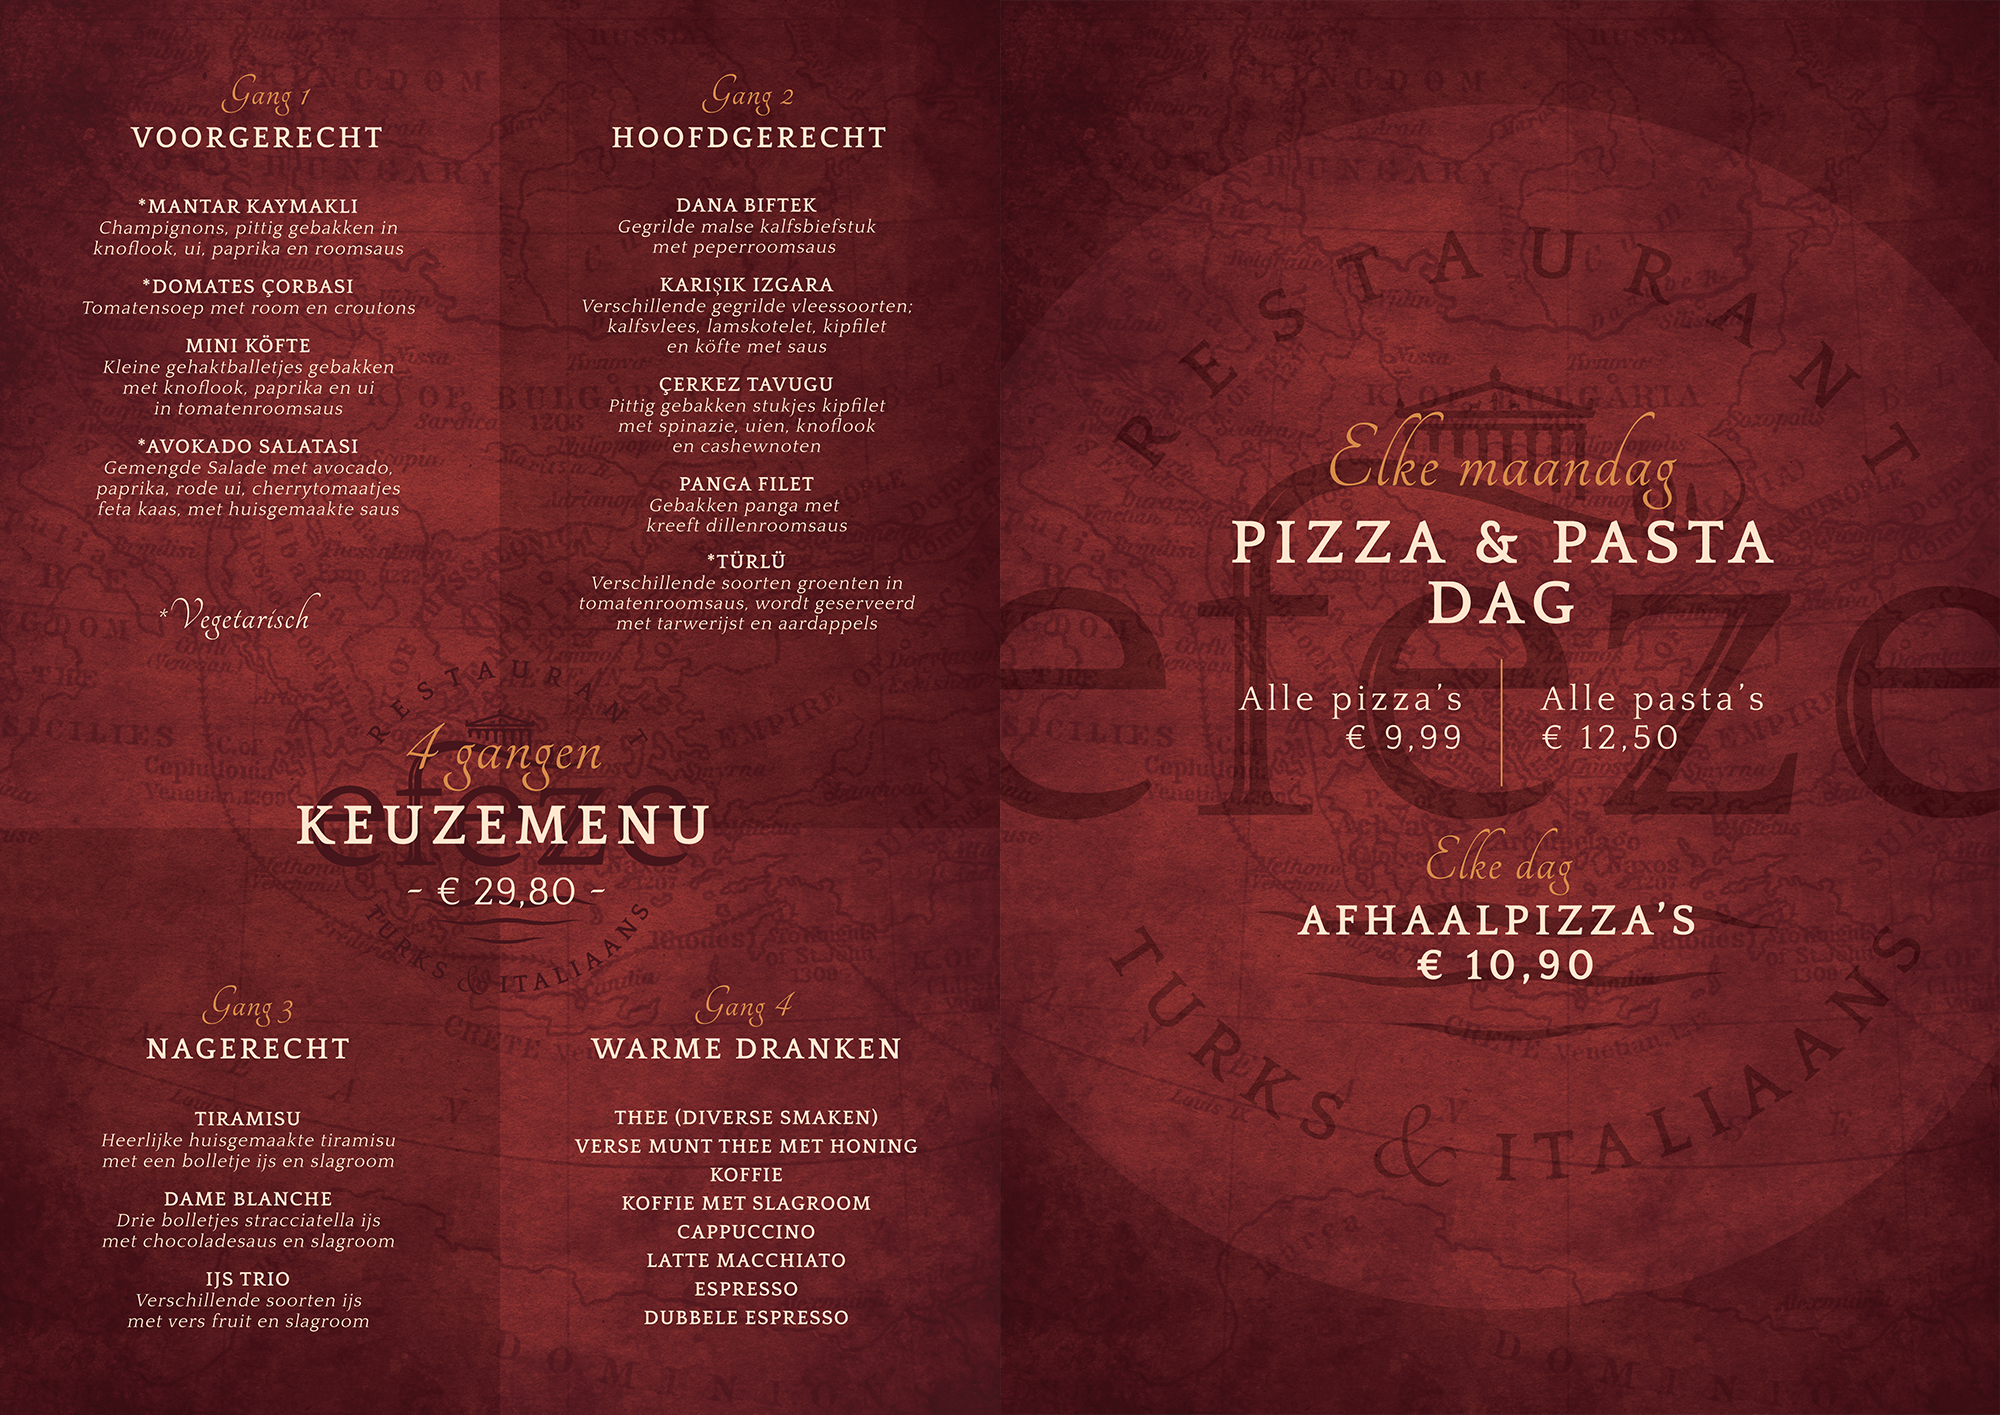 pizza-dag